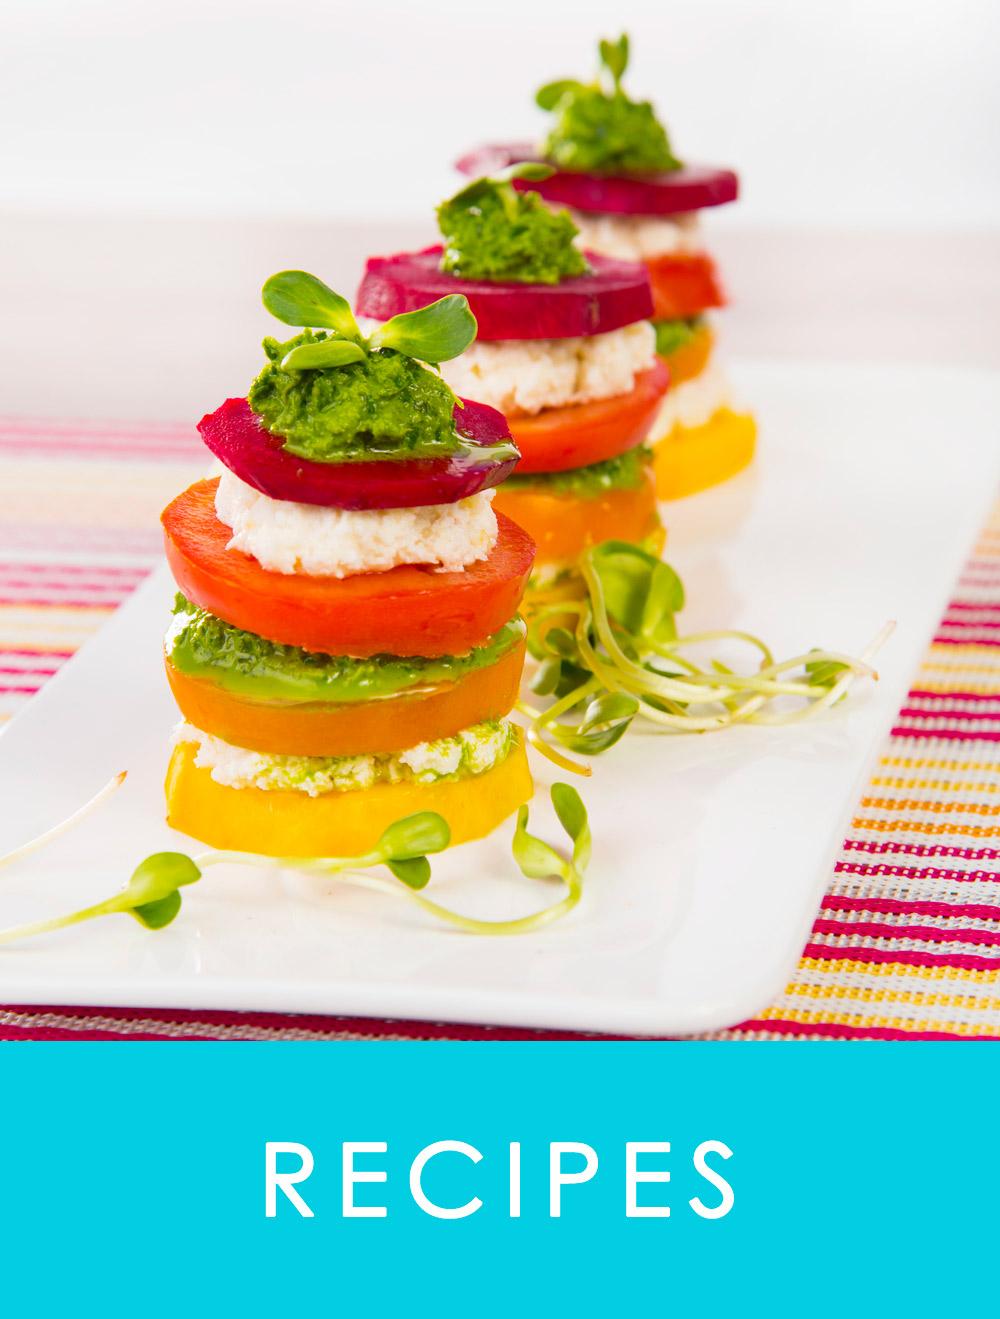 Recipes-Opt.jpg